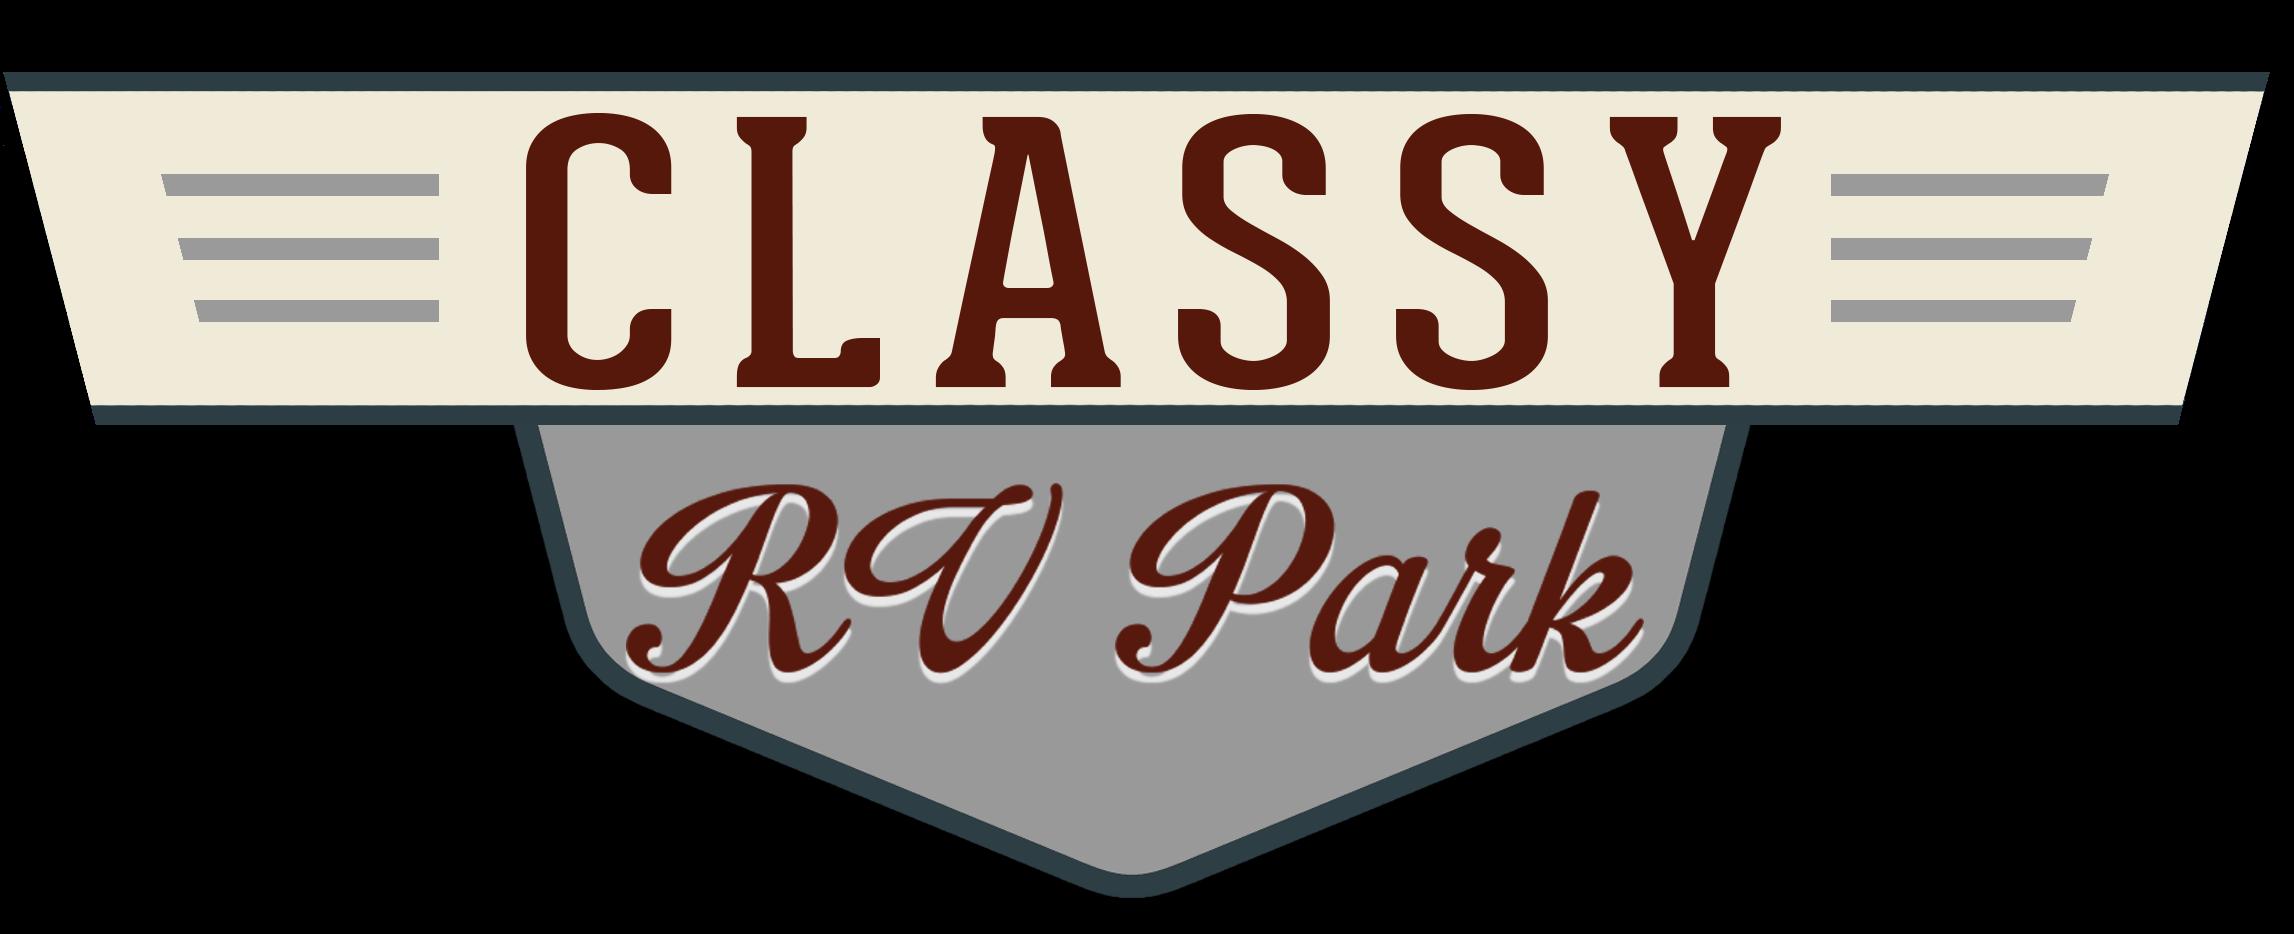 Classy RV Park